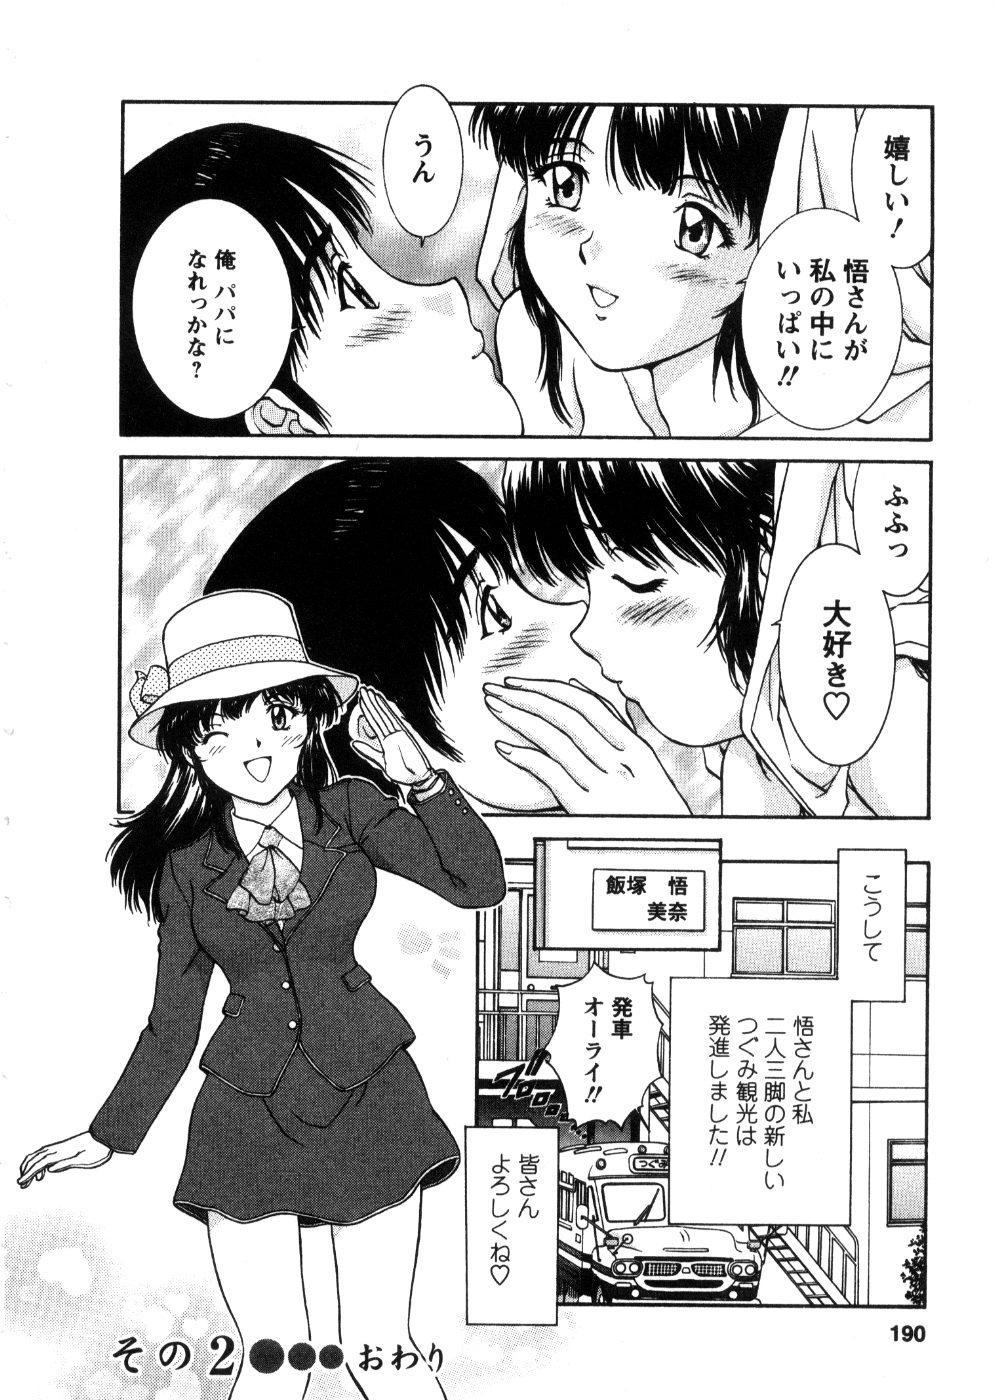 Oneechan-tachi ga Yatte Kuru 03 191